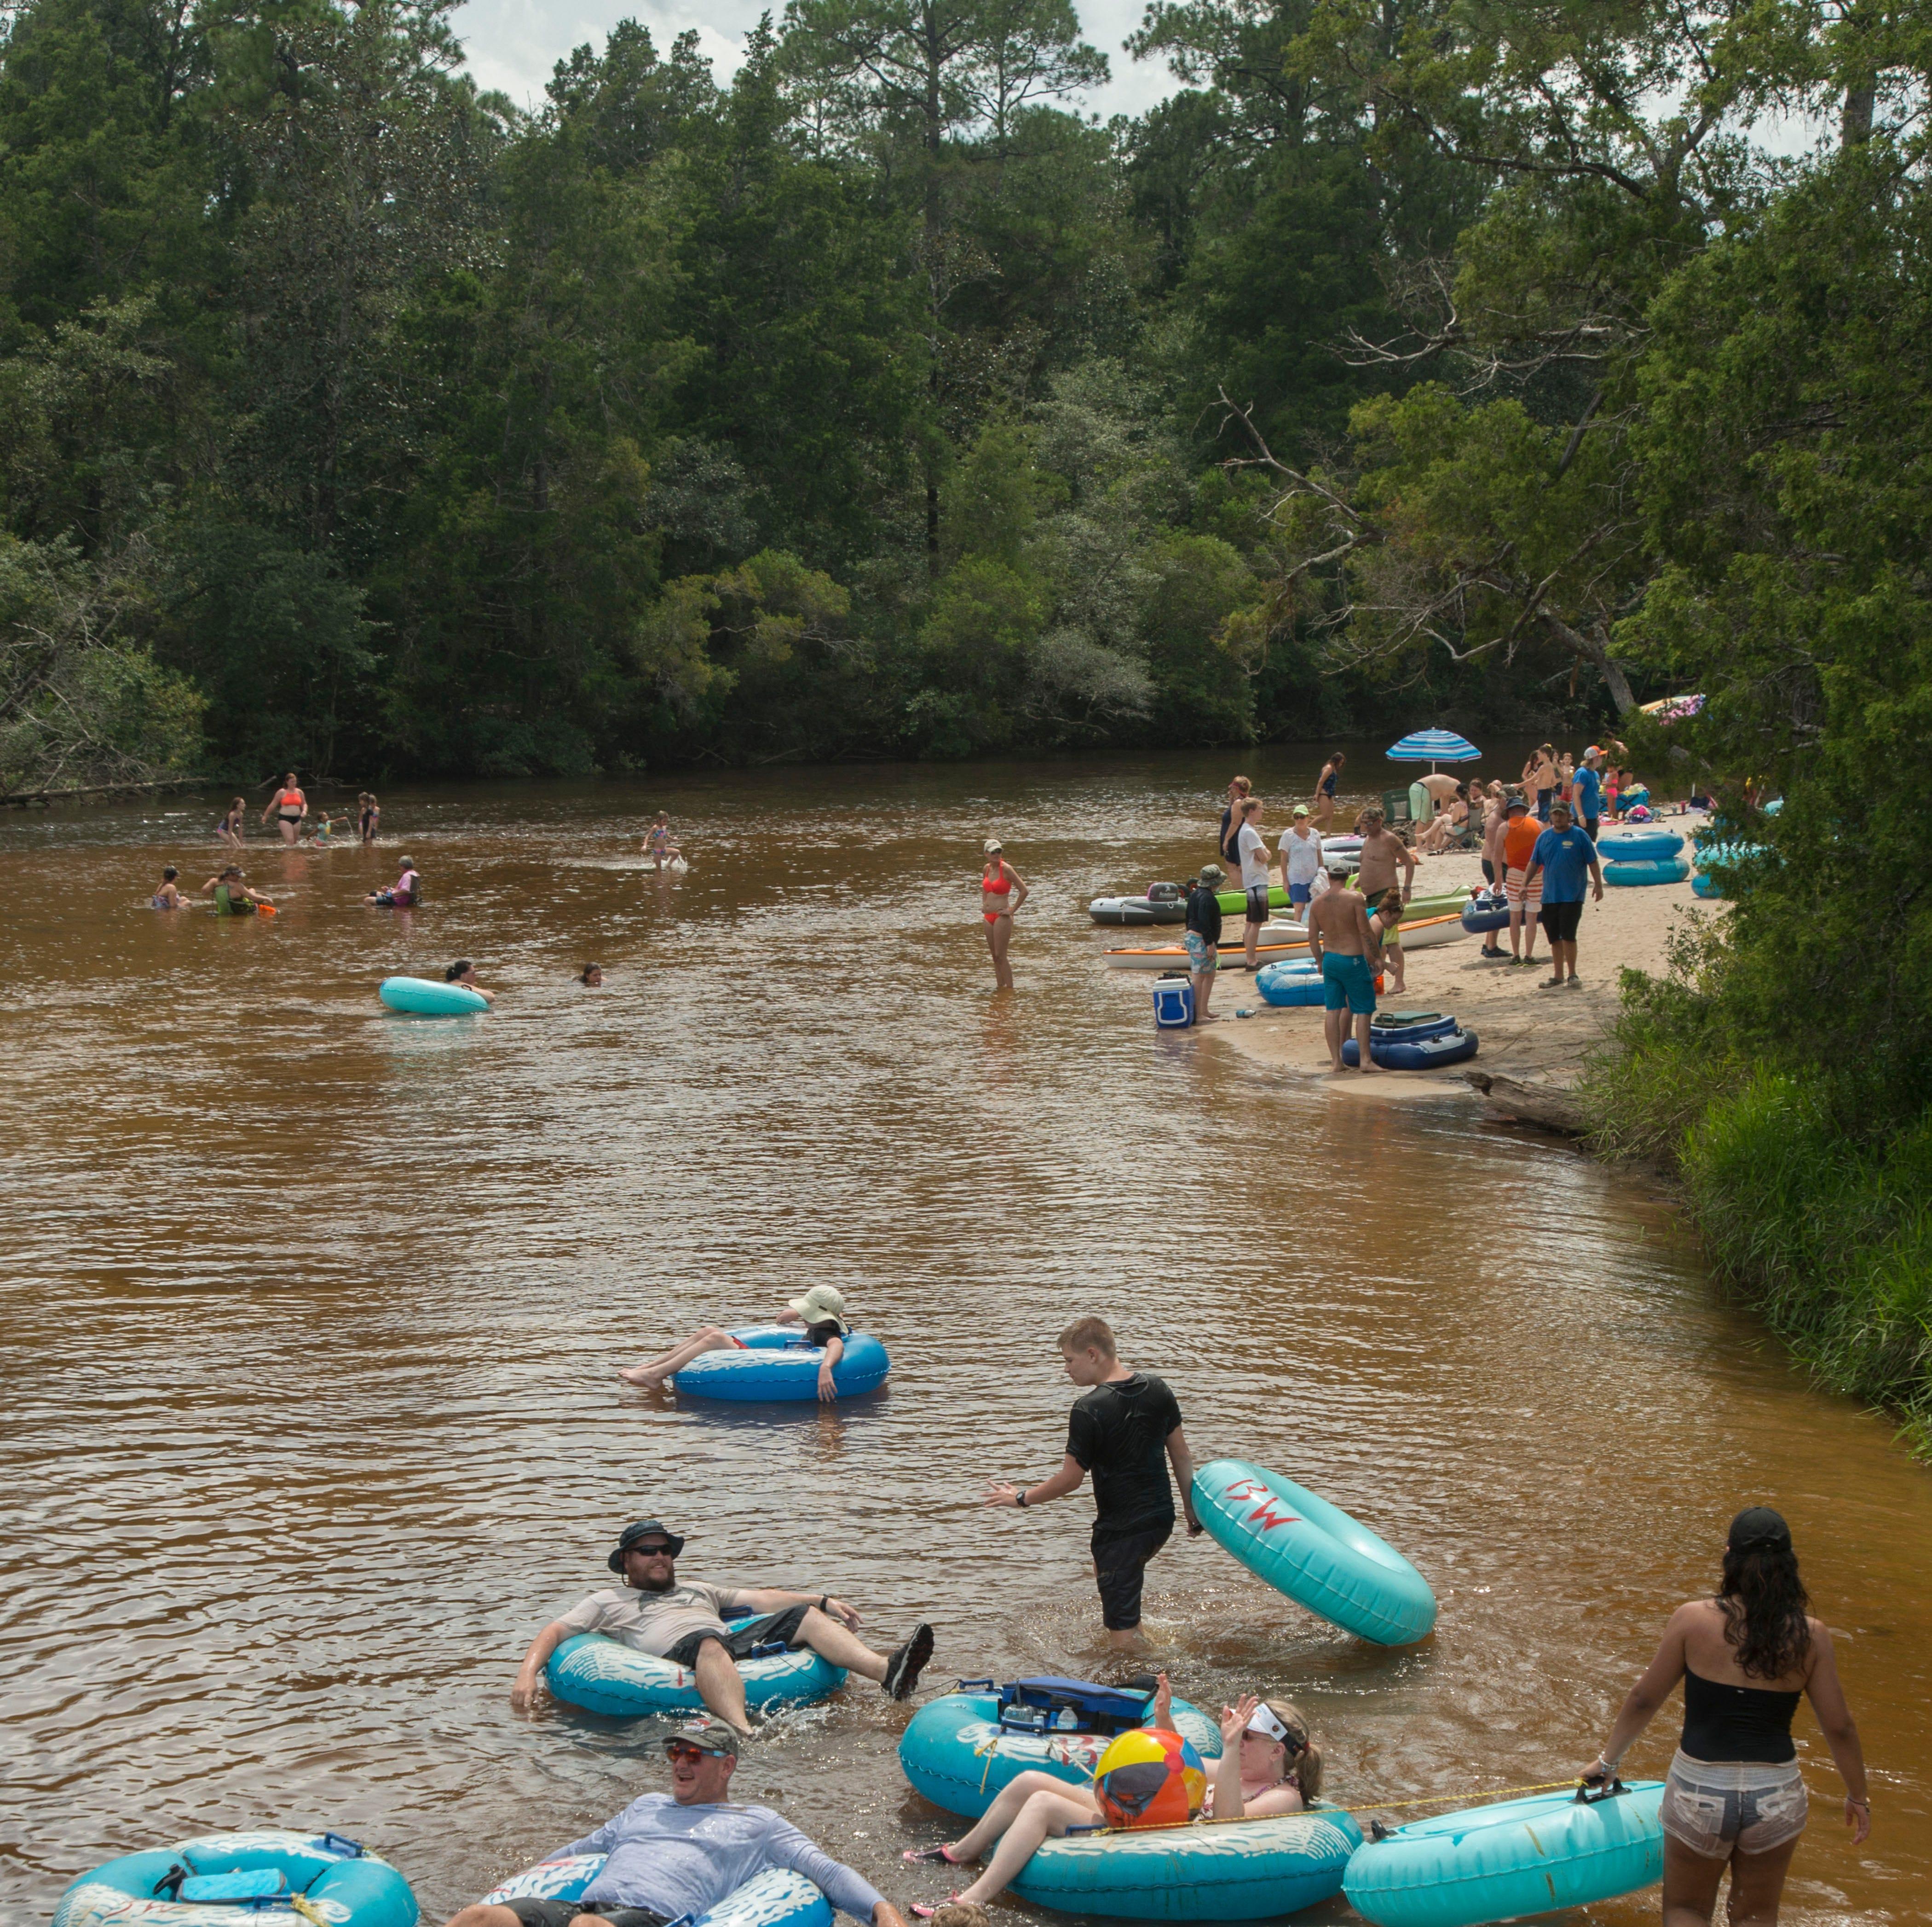 Photos: Camping, kayaking at Adventures Unlimited